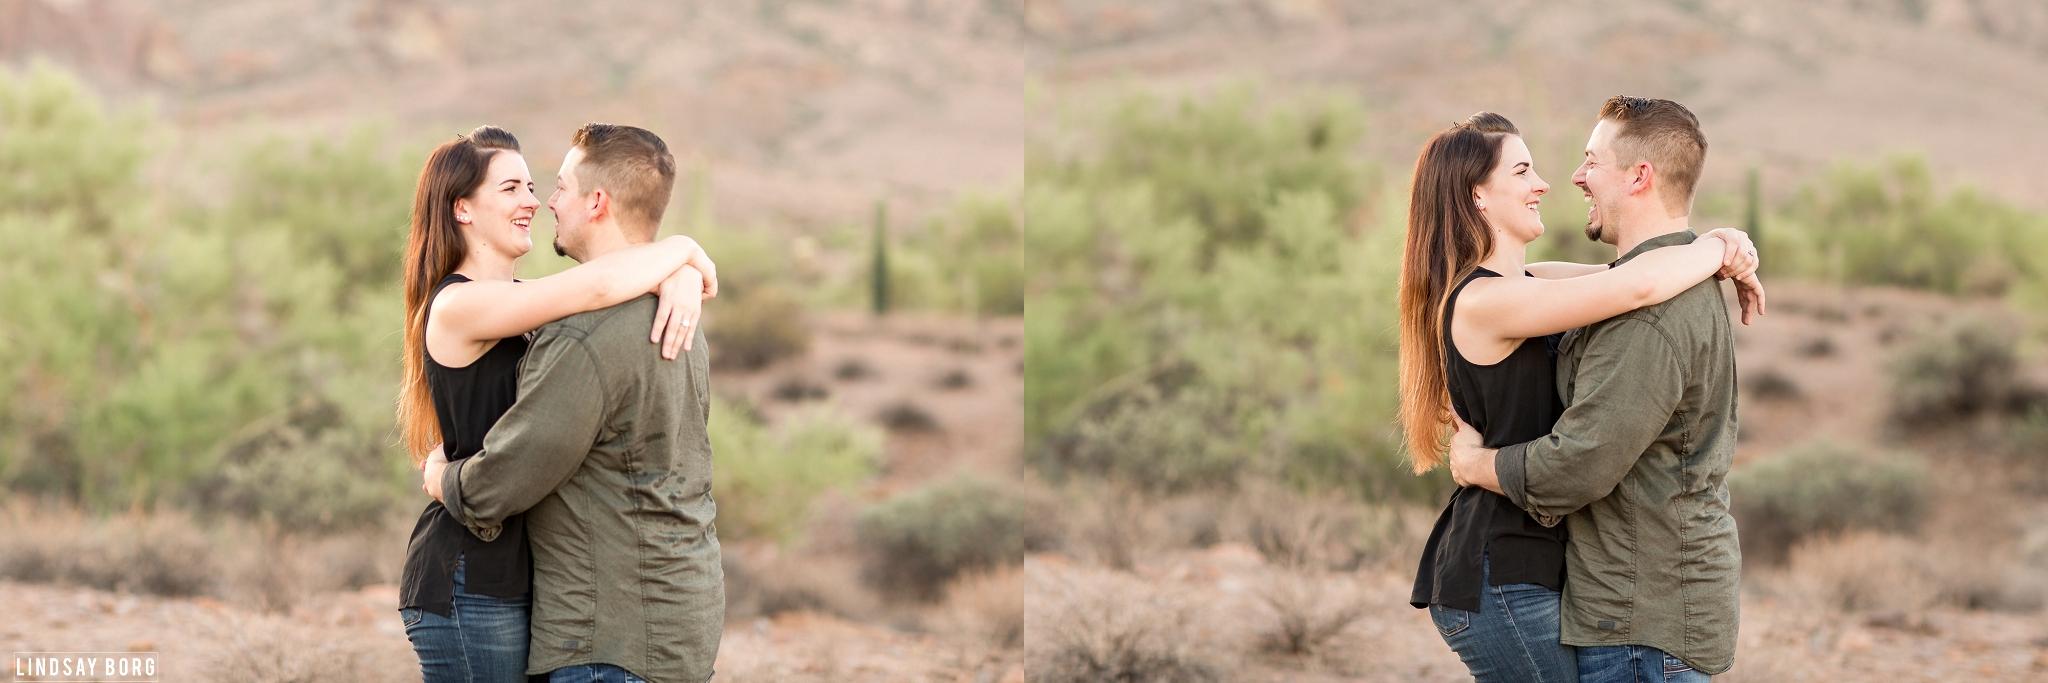 Lindsay-Borg-Photography-Arizona-engagement-photographer-lost-dutchman (5).jpg